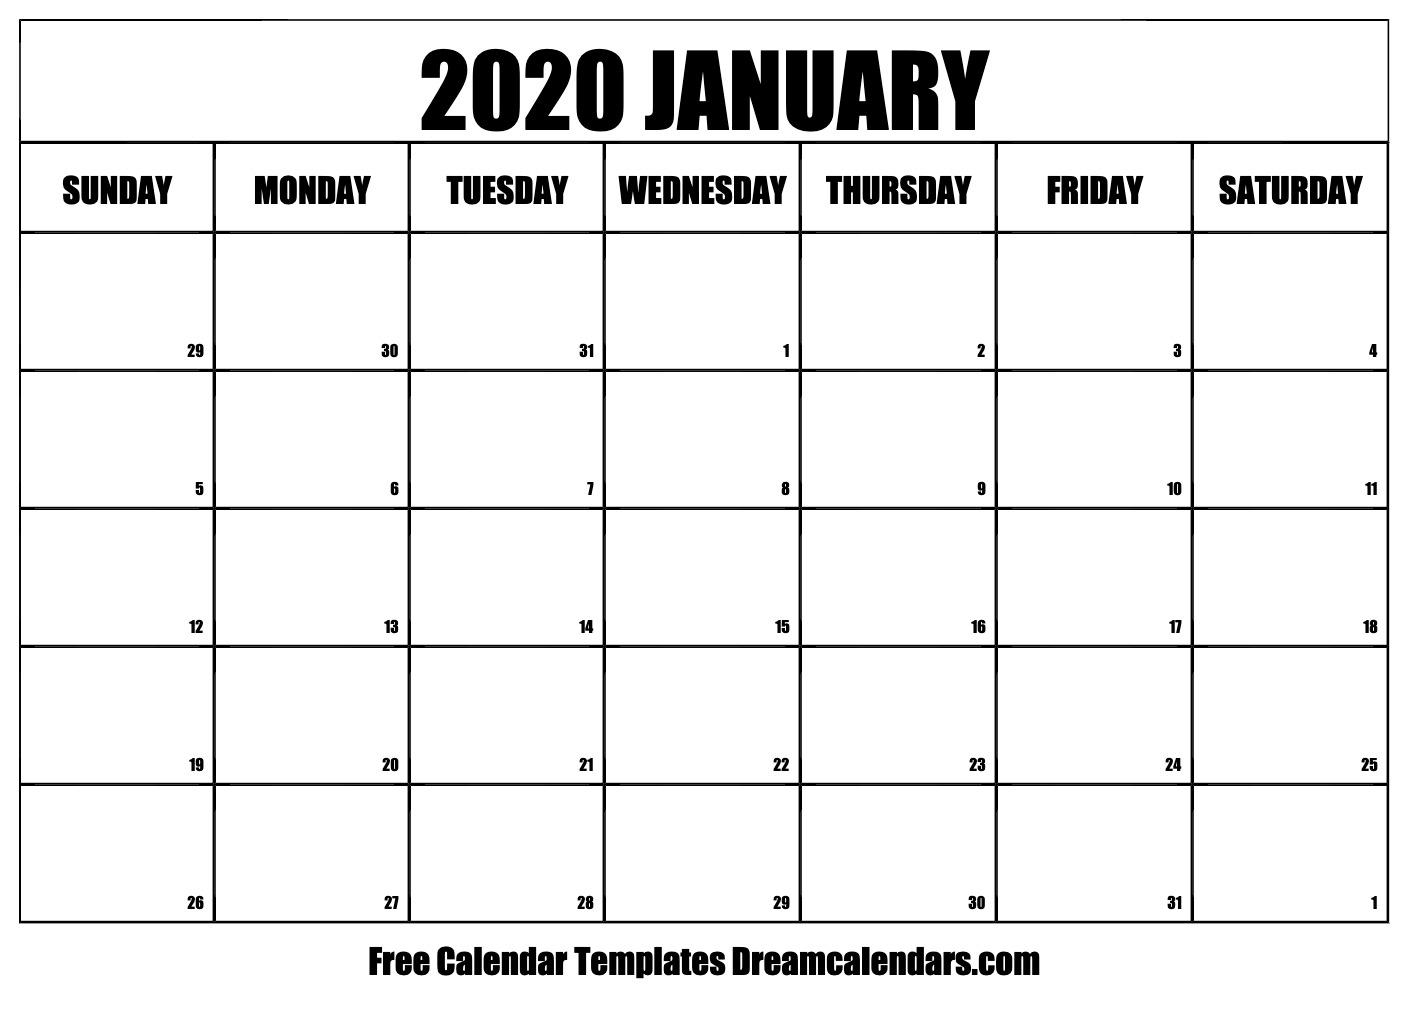 Printable January 2020 Calendar regarding Free Printable 2020 Calendar To I Can Edit